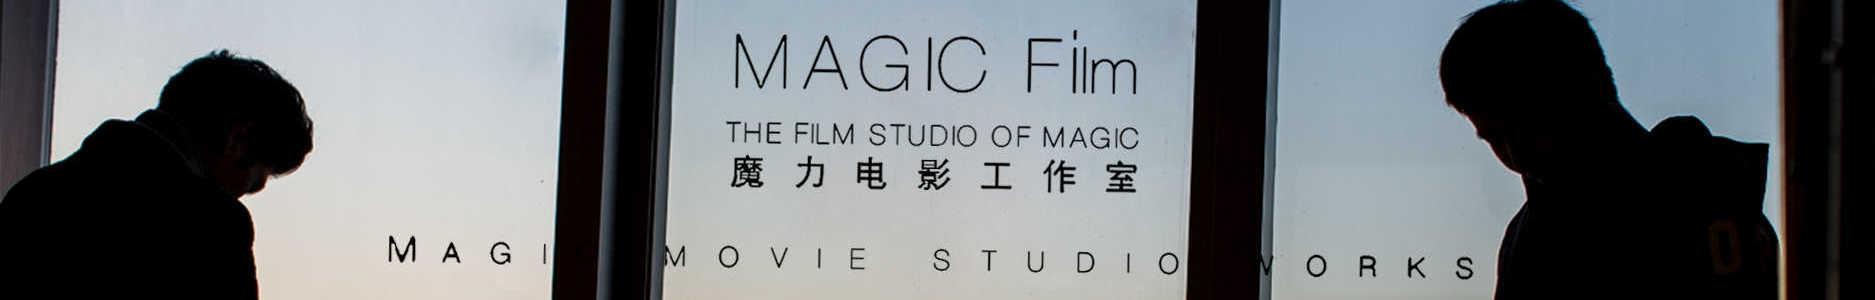 MAGICfilms banner